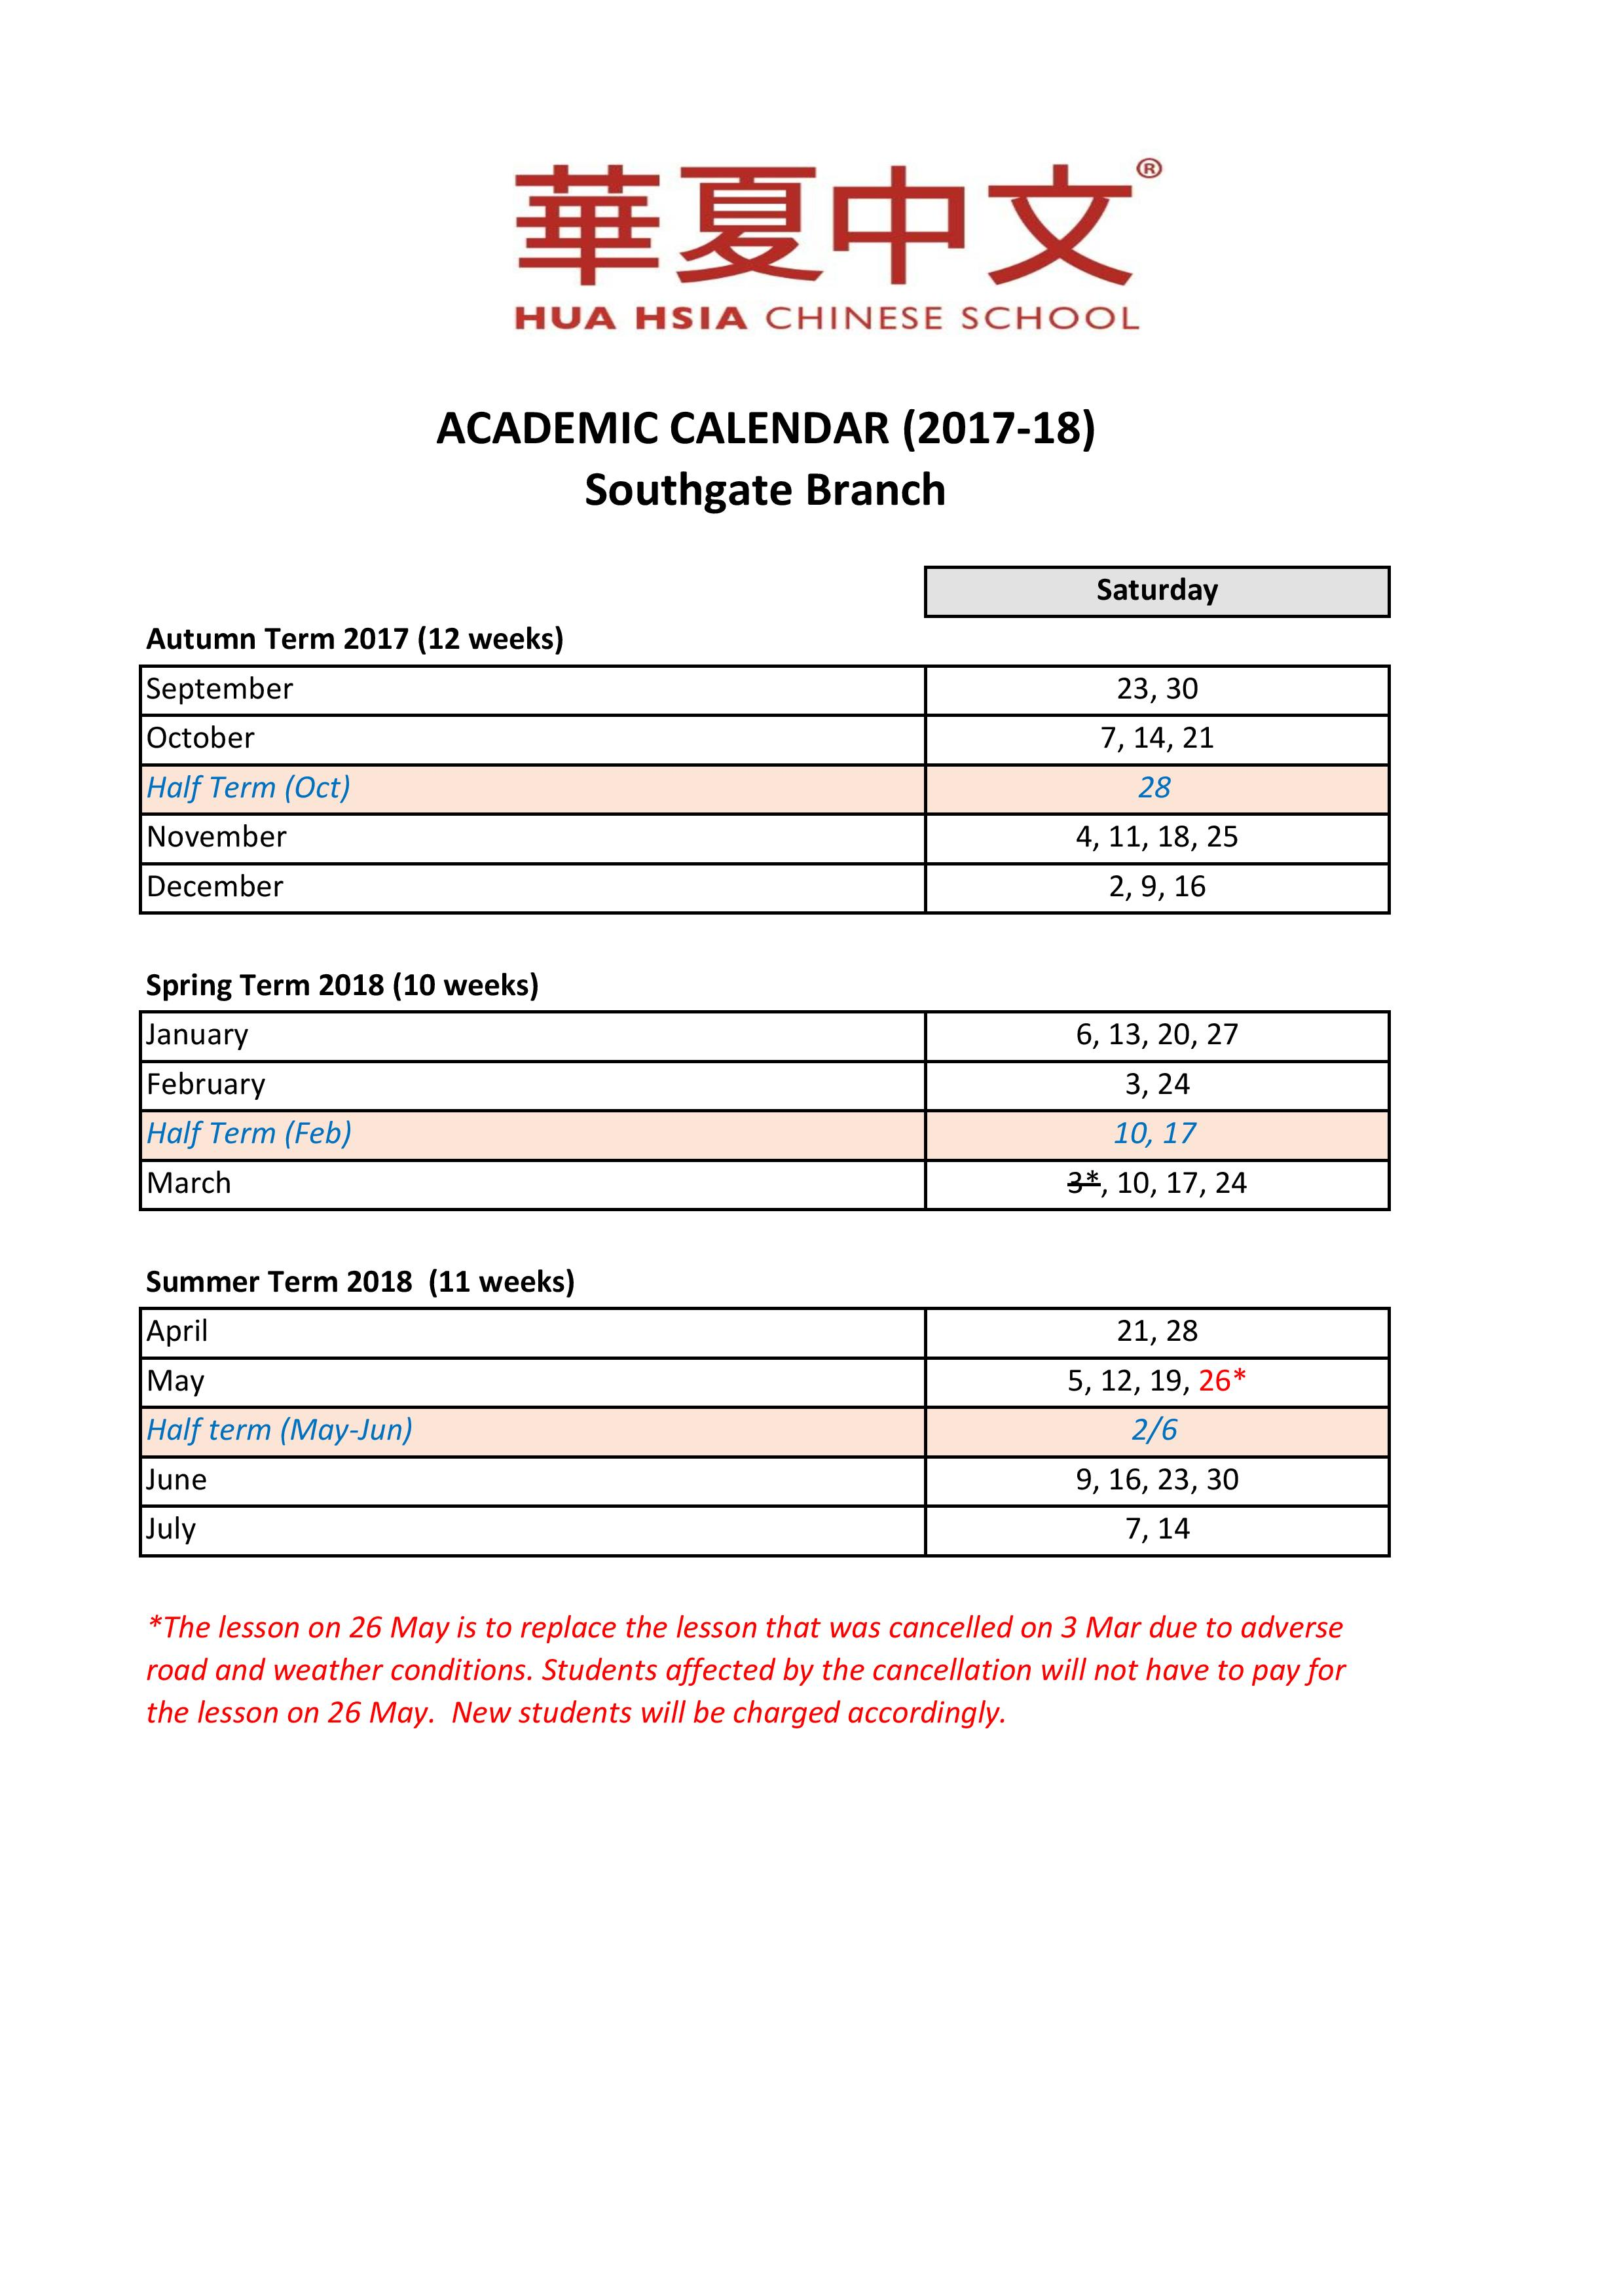 Academic Calendar (2017-18) – Southgate-page-001 (1)